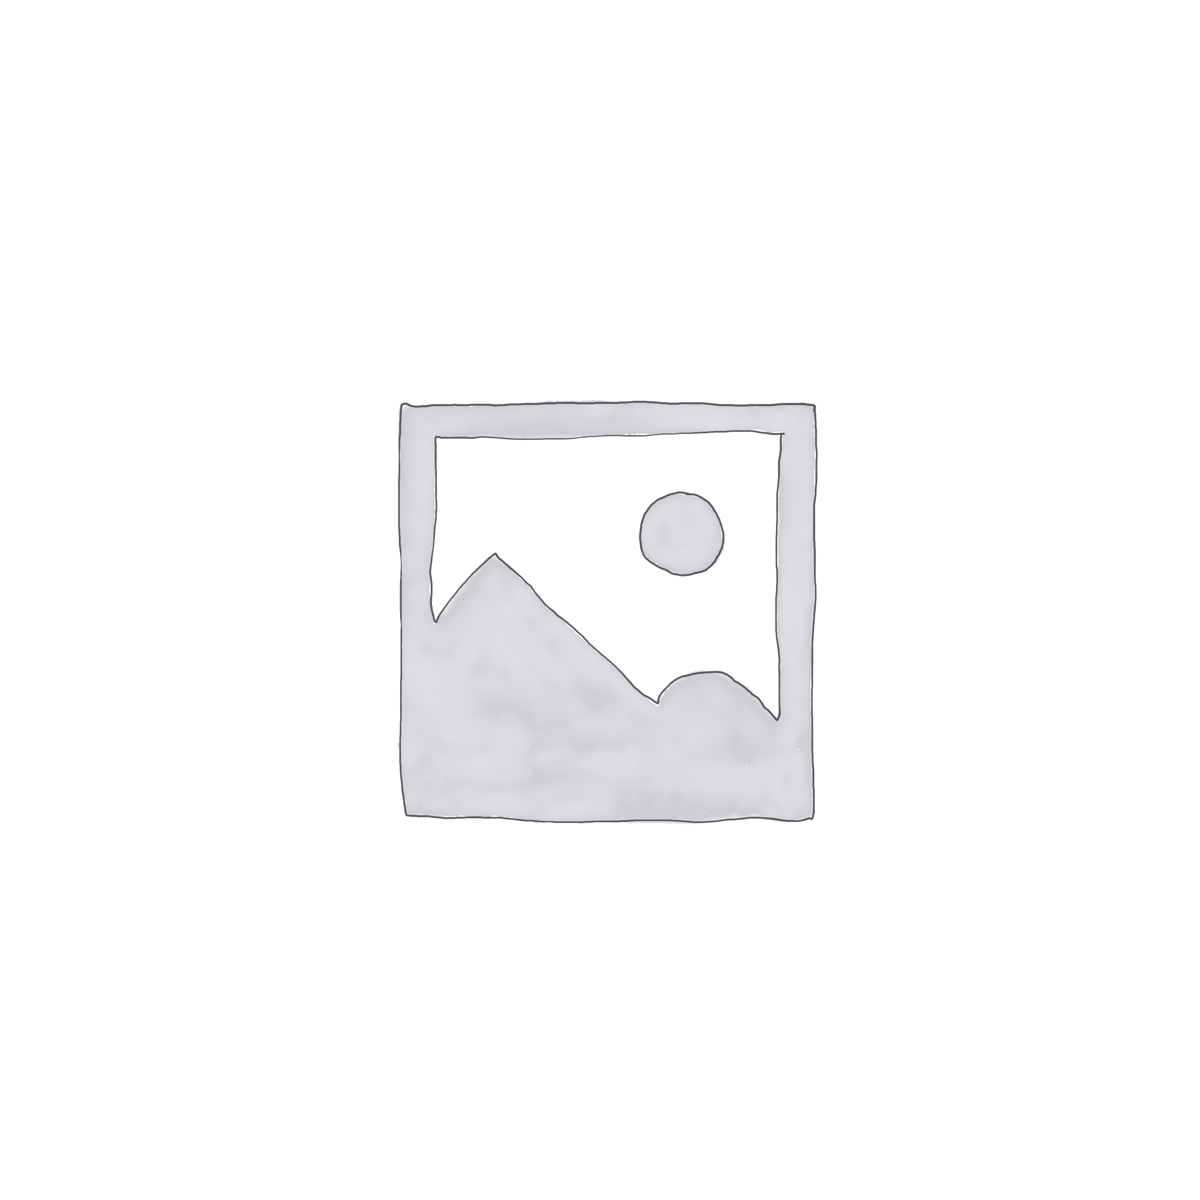 ARMASPEED – PORSCHE 911 991 MK1 3.8L GT3 FILTERS